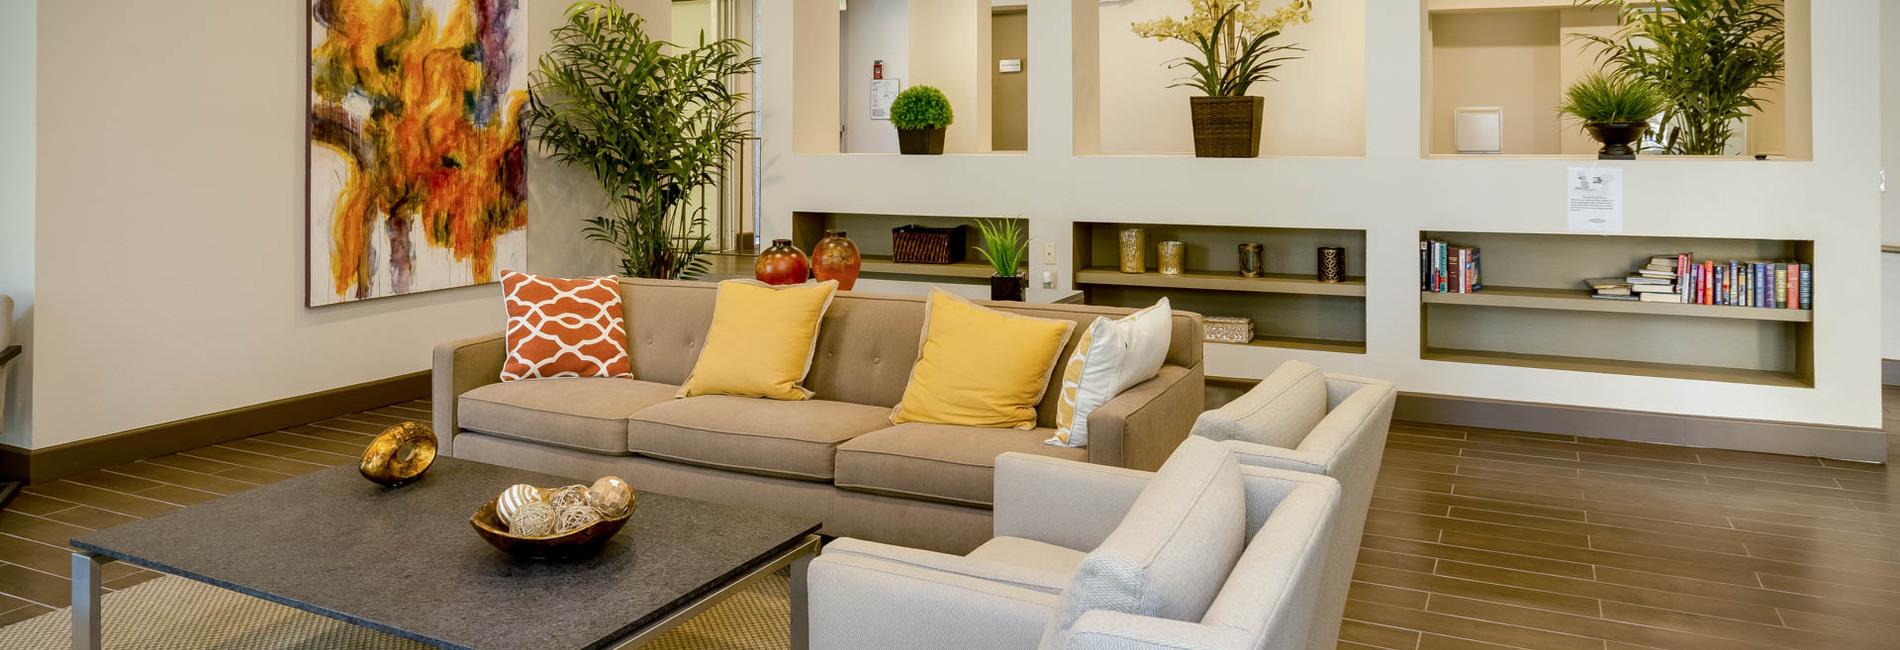 Oak Park Apartments In Monrovia Ca